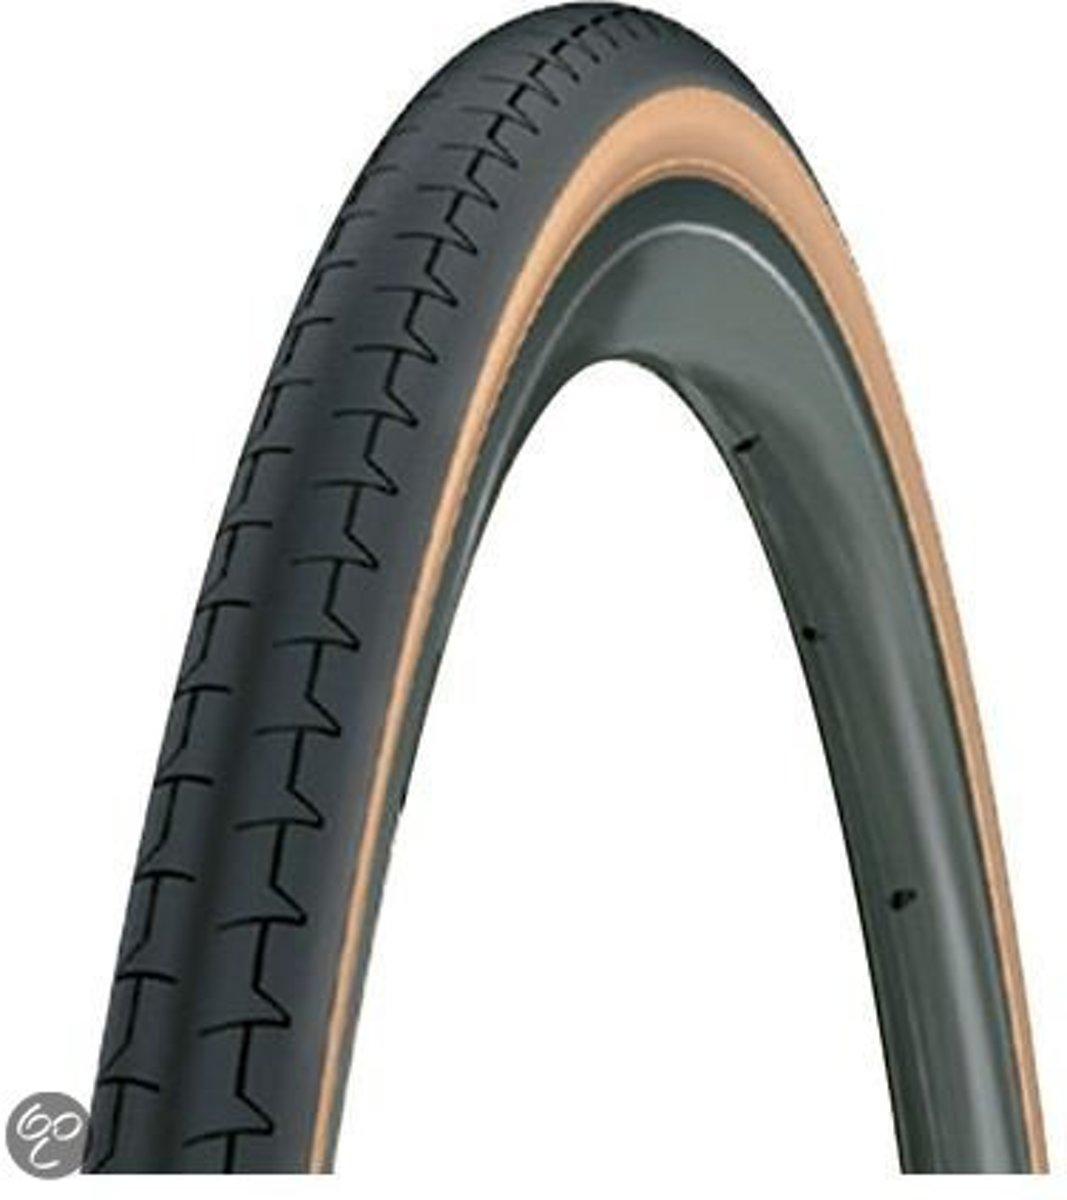 Michelin Dynamic Classic 28-622 zwart/transparant Bandenmaat 28-622 | 700 x 28c